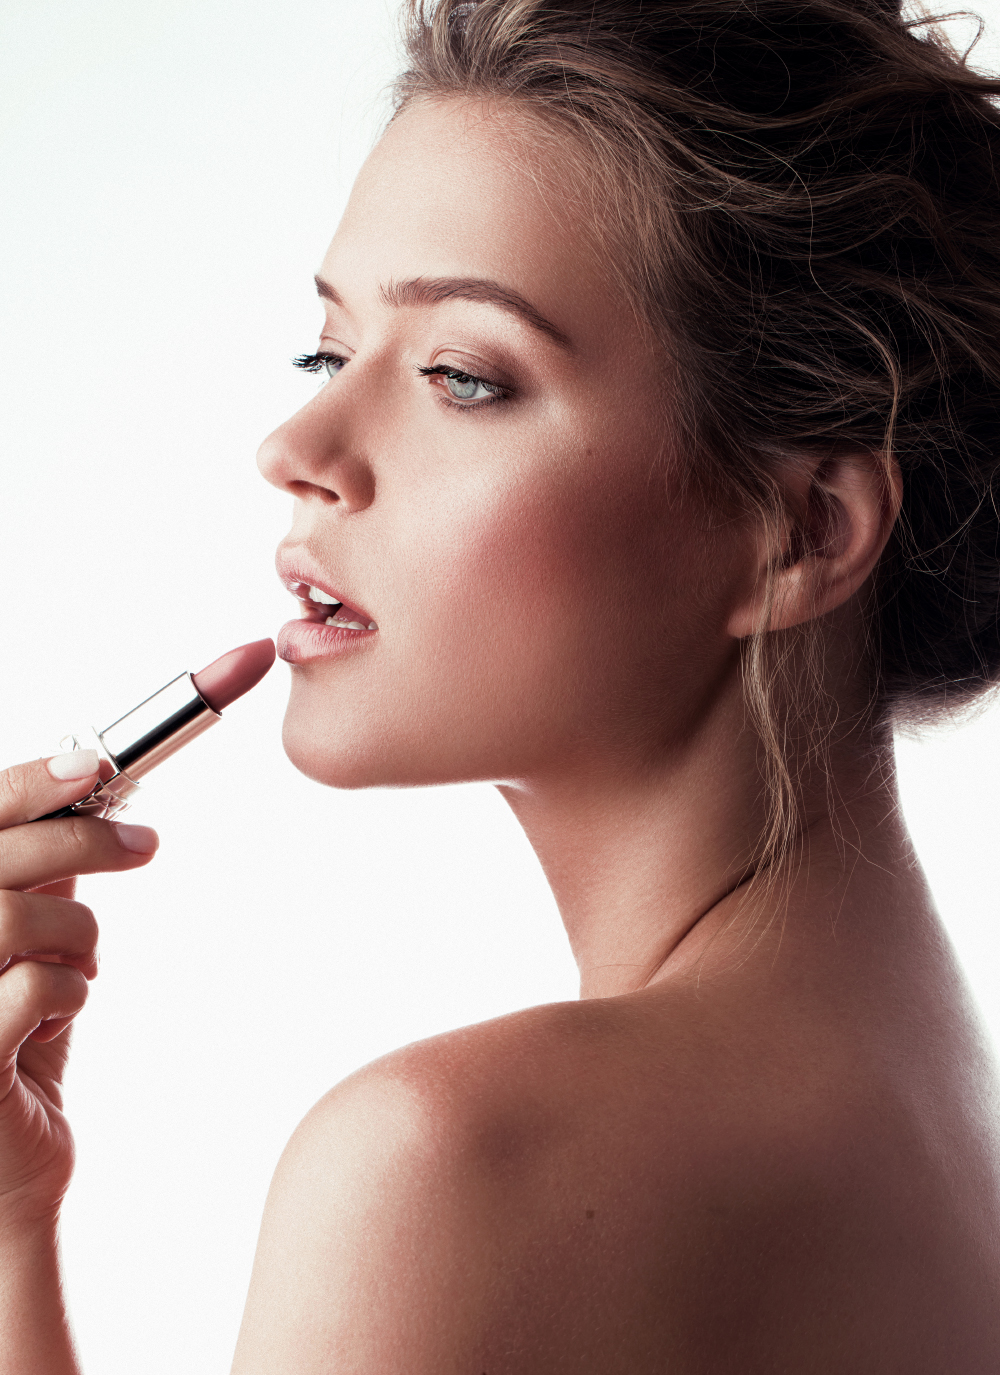 Hot Liza Kei nudes (92 photo), Tits, Paparazzi, Feet, cleavage 2018